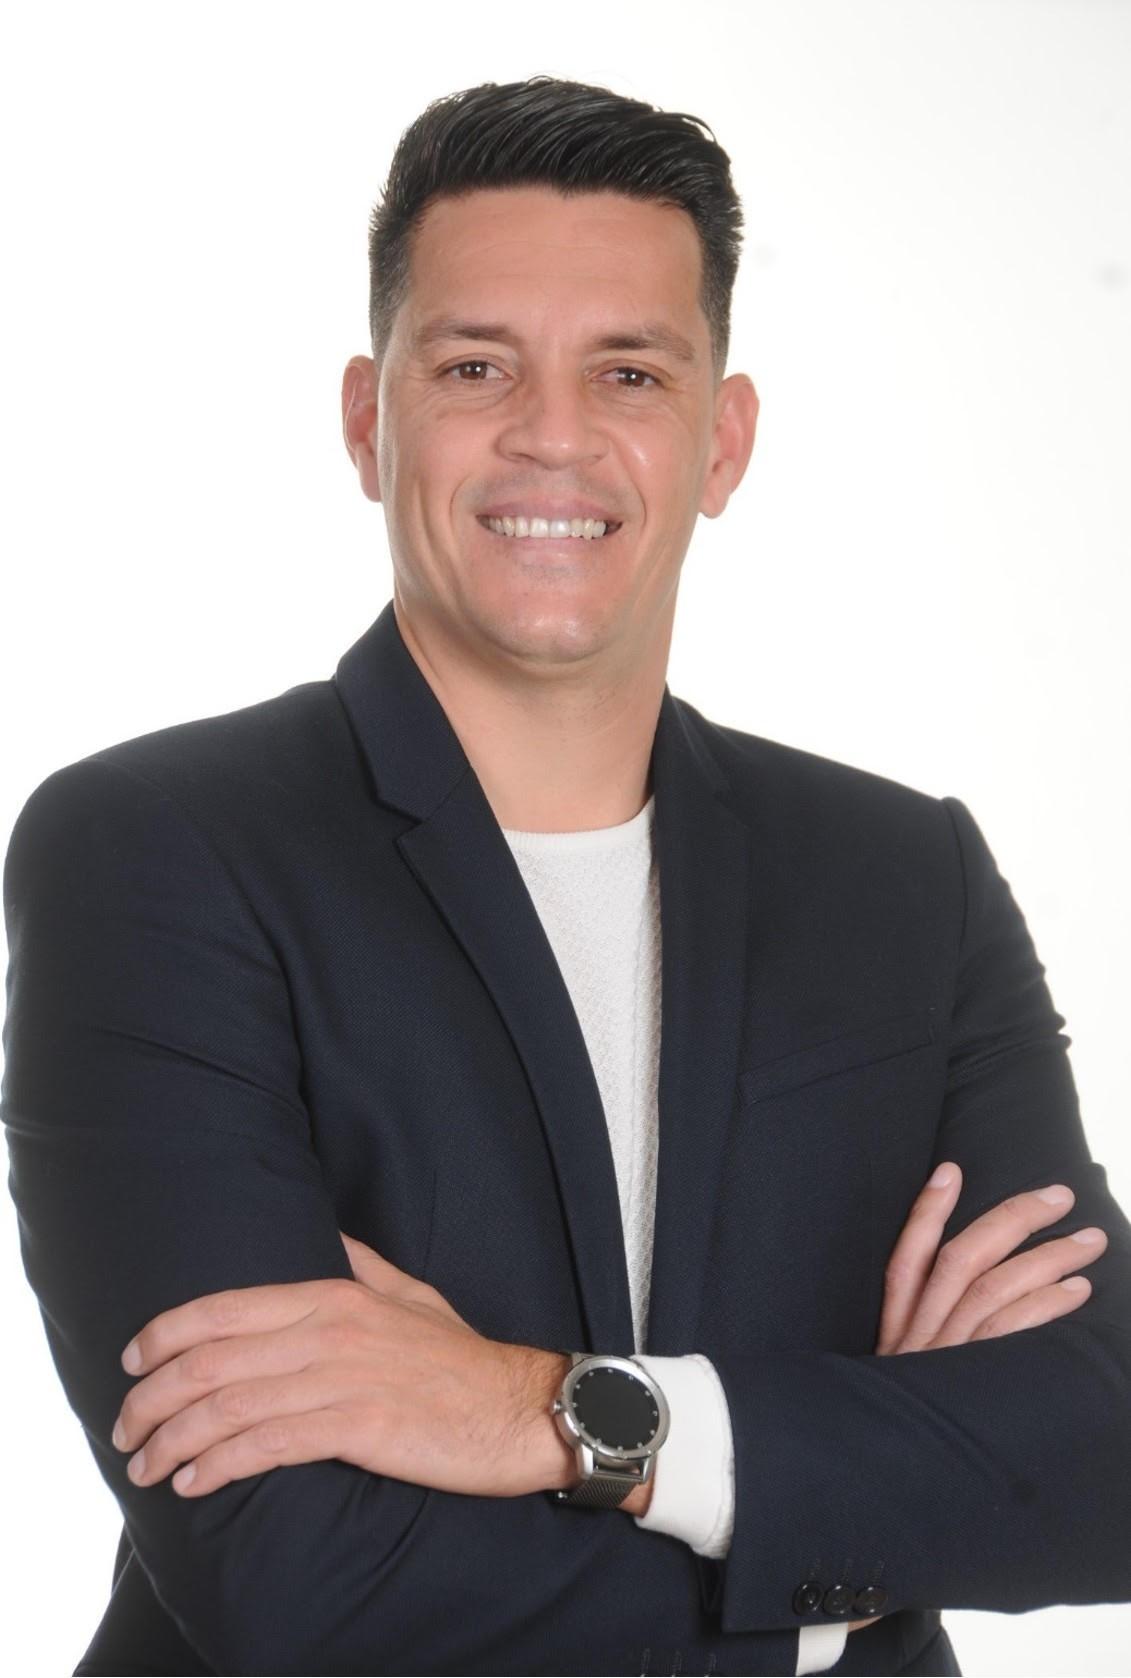 Hector Carmelo Robaina Hernandez